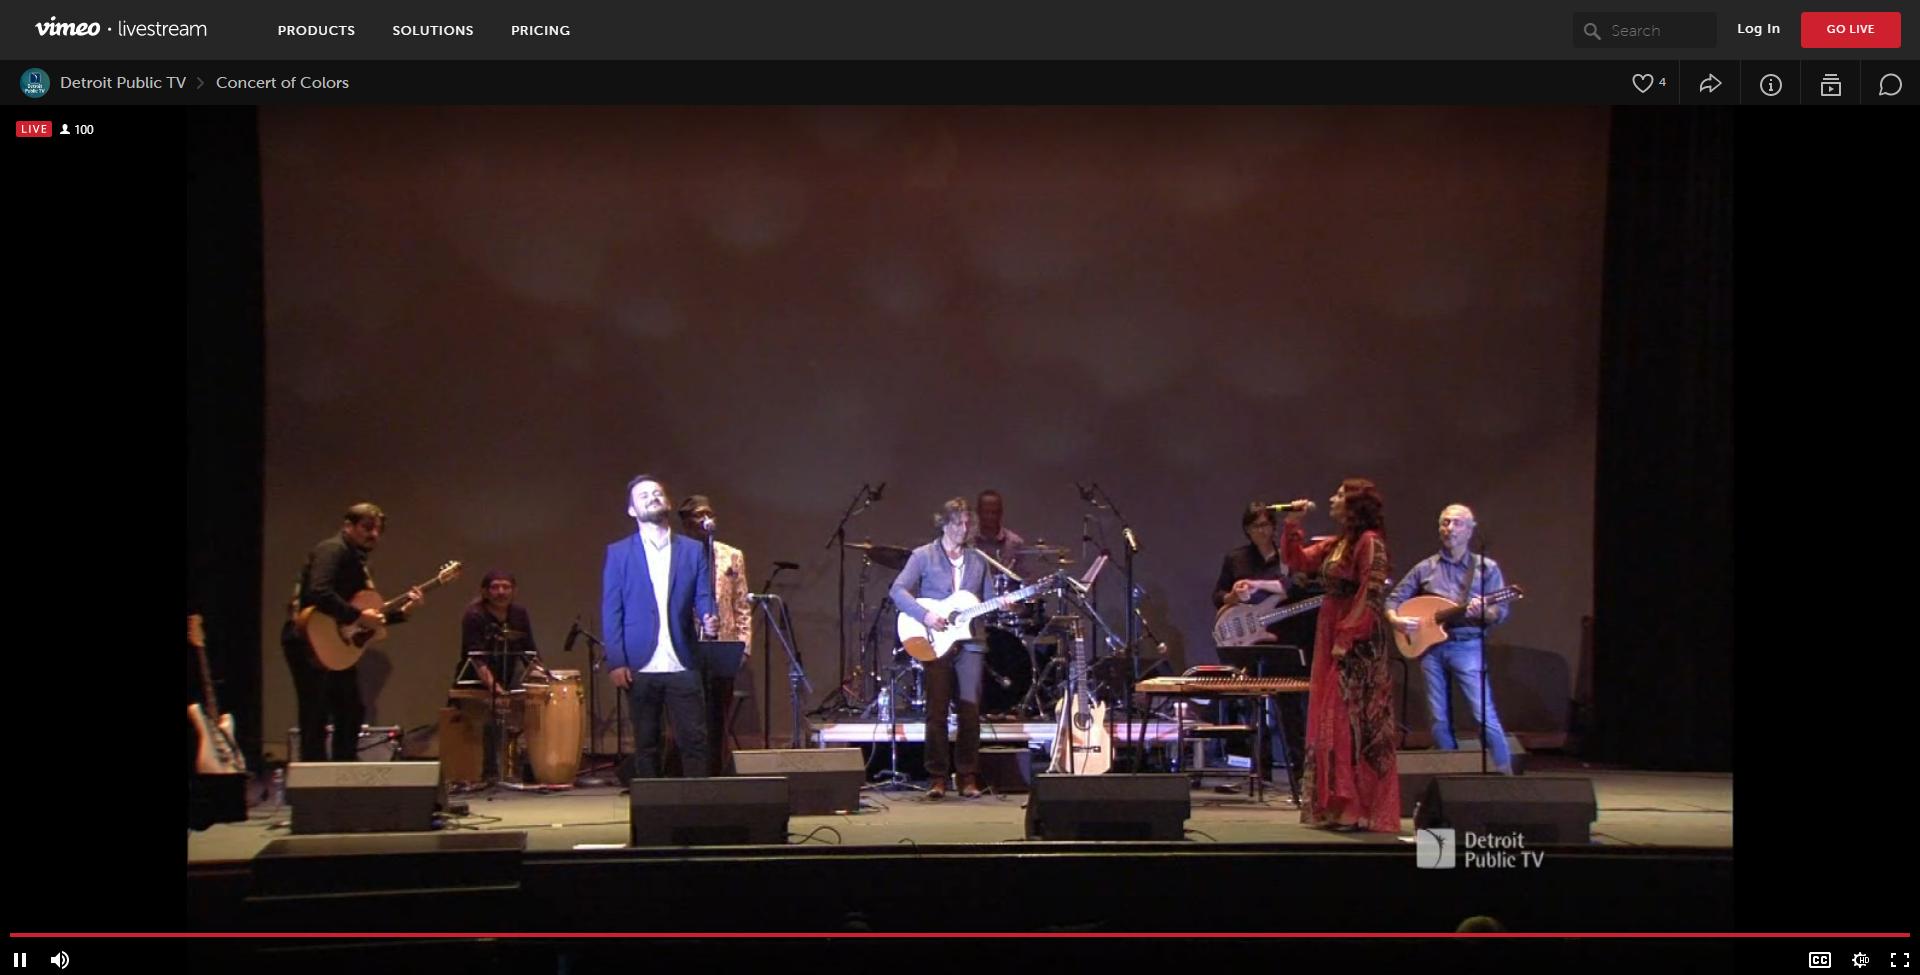 Screenshot of Sean Blackman, Concert of Colors on PBS, Oct. 8, 2020